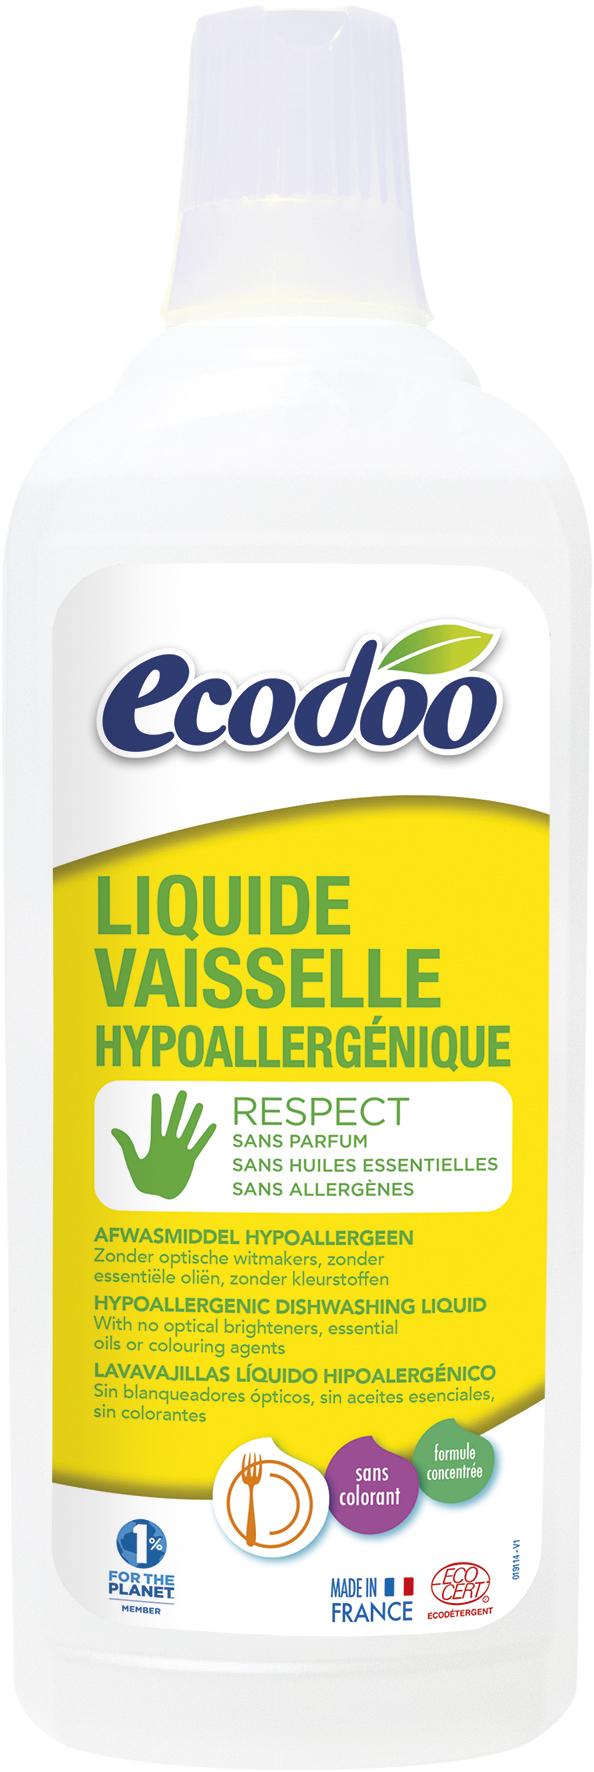 Liquide vaisselle hypoallergénique, Ecodoo (750 ml)